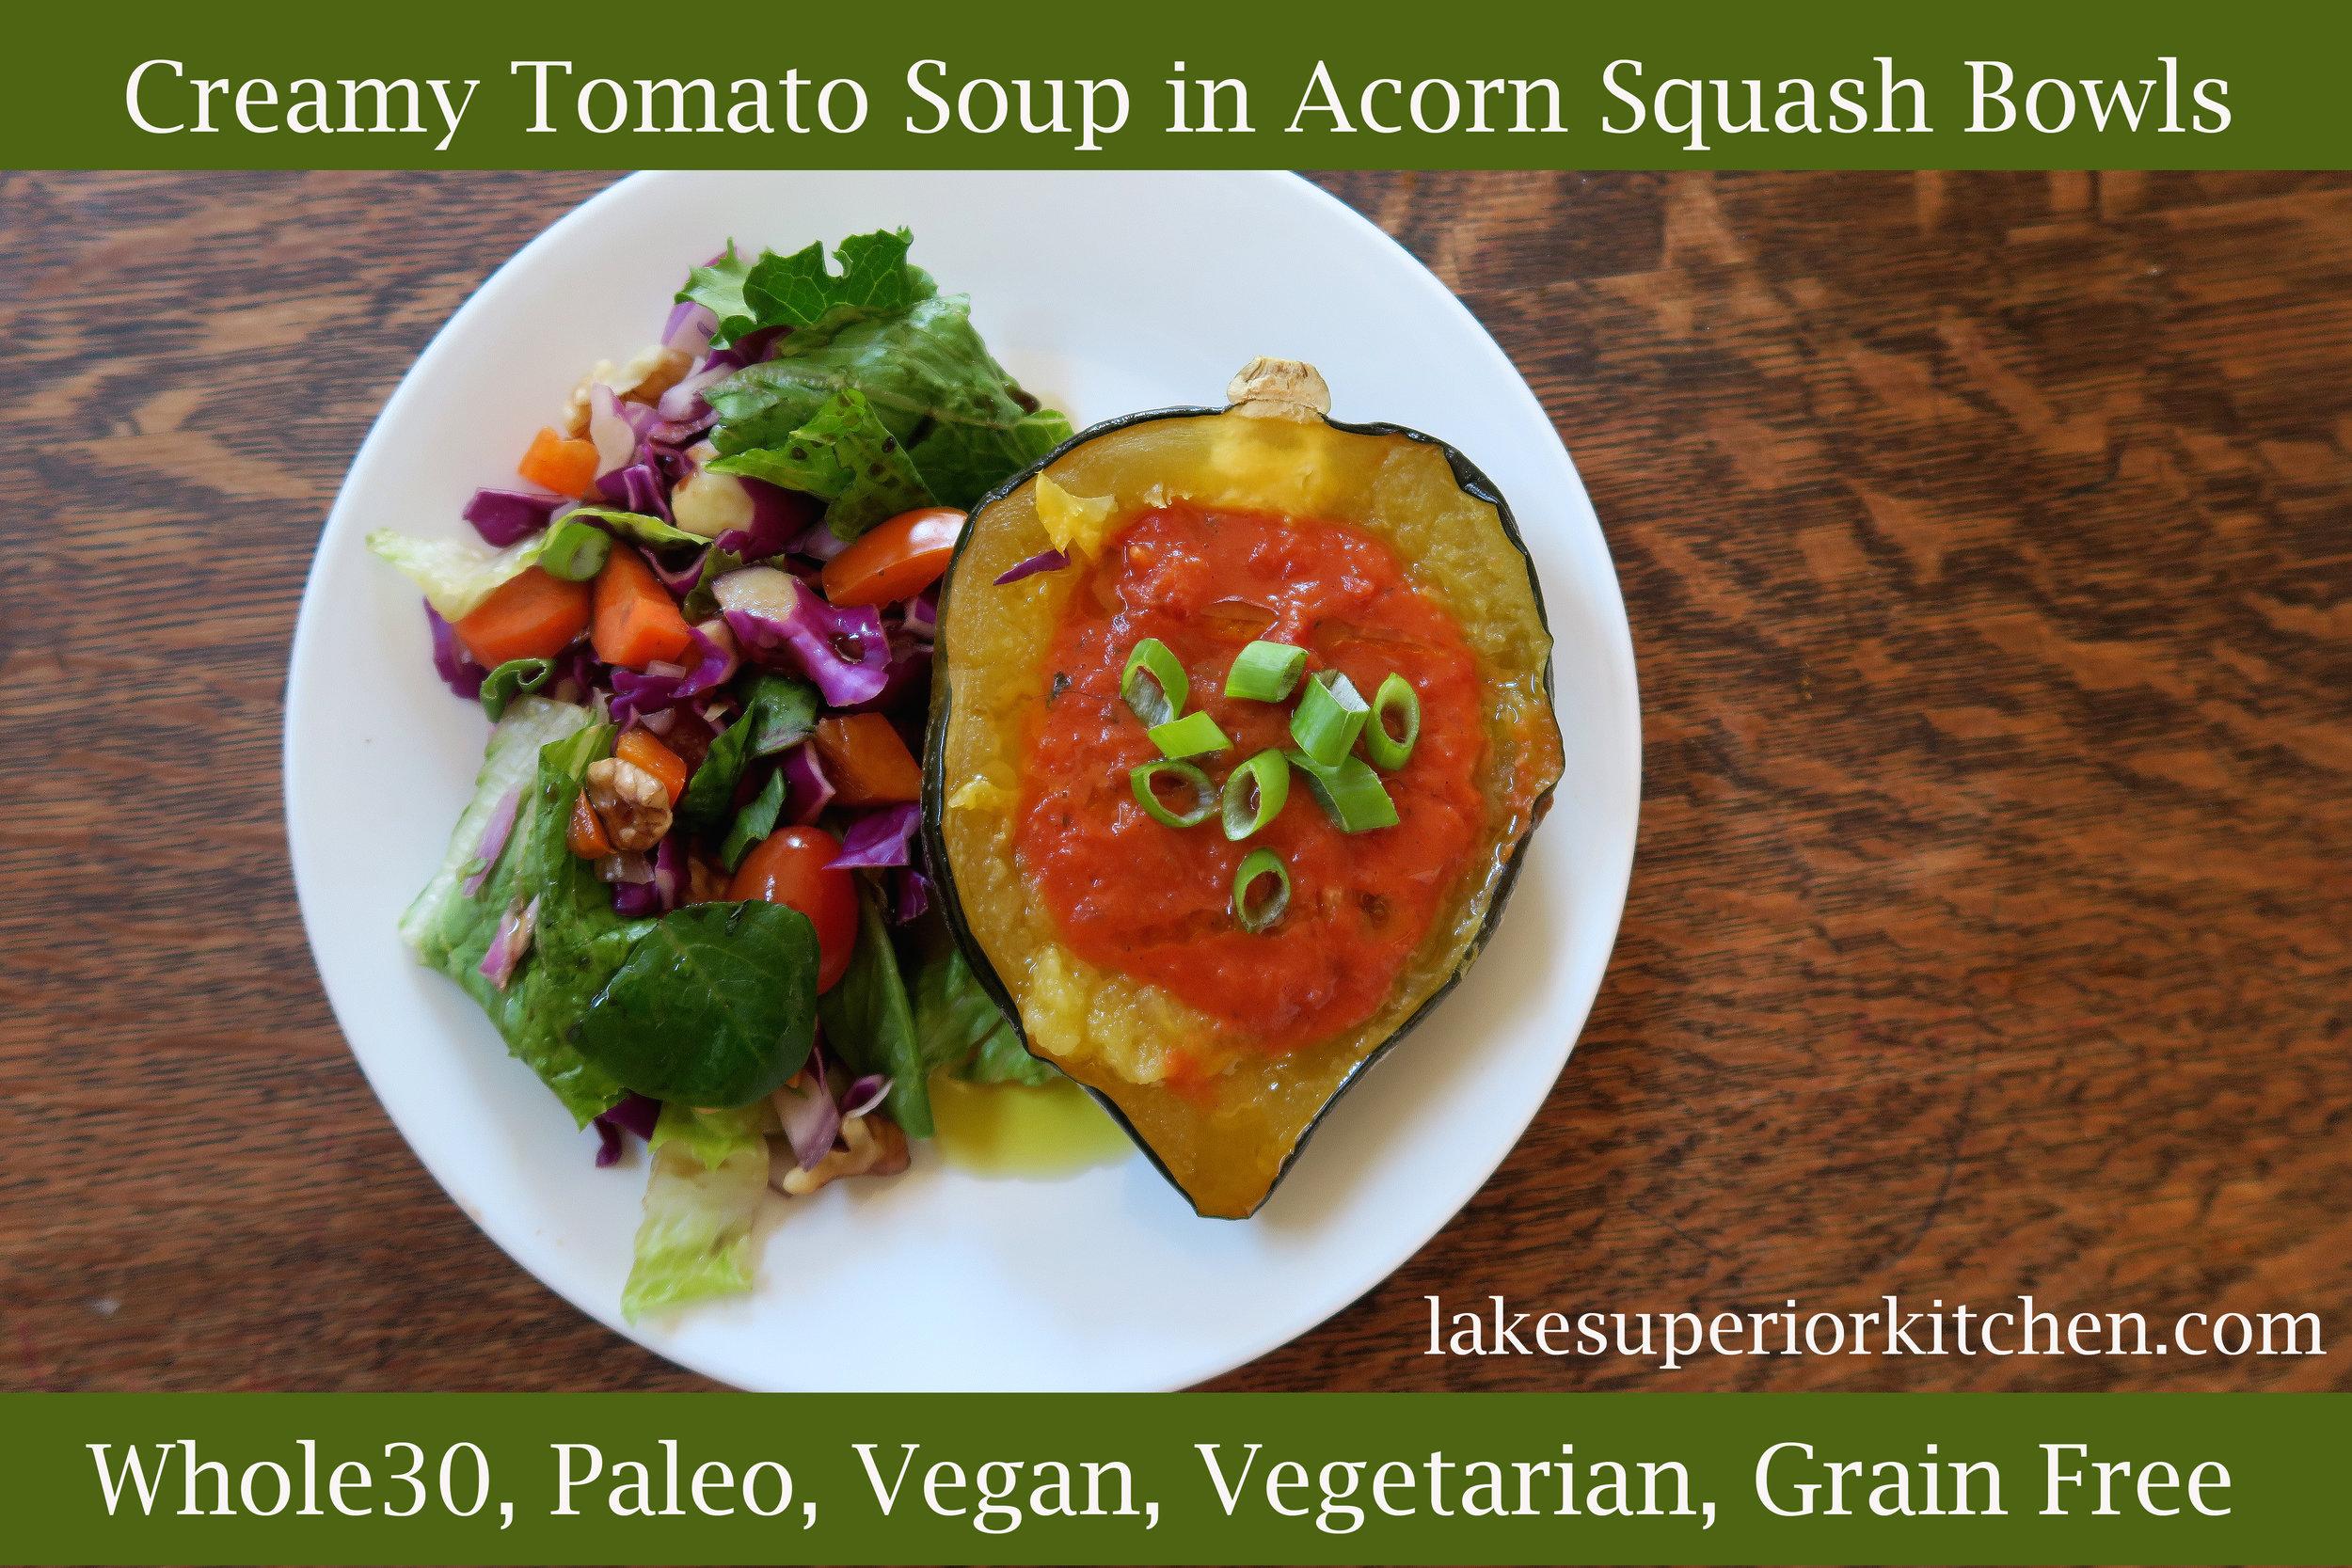 whole30, whole30recipes, tomato soup, vegan, vegetarian, paleo, paleo recipe, soup, healthy soup